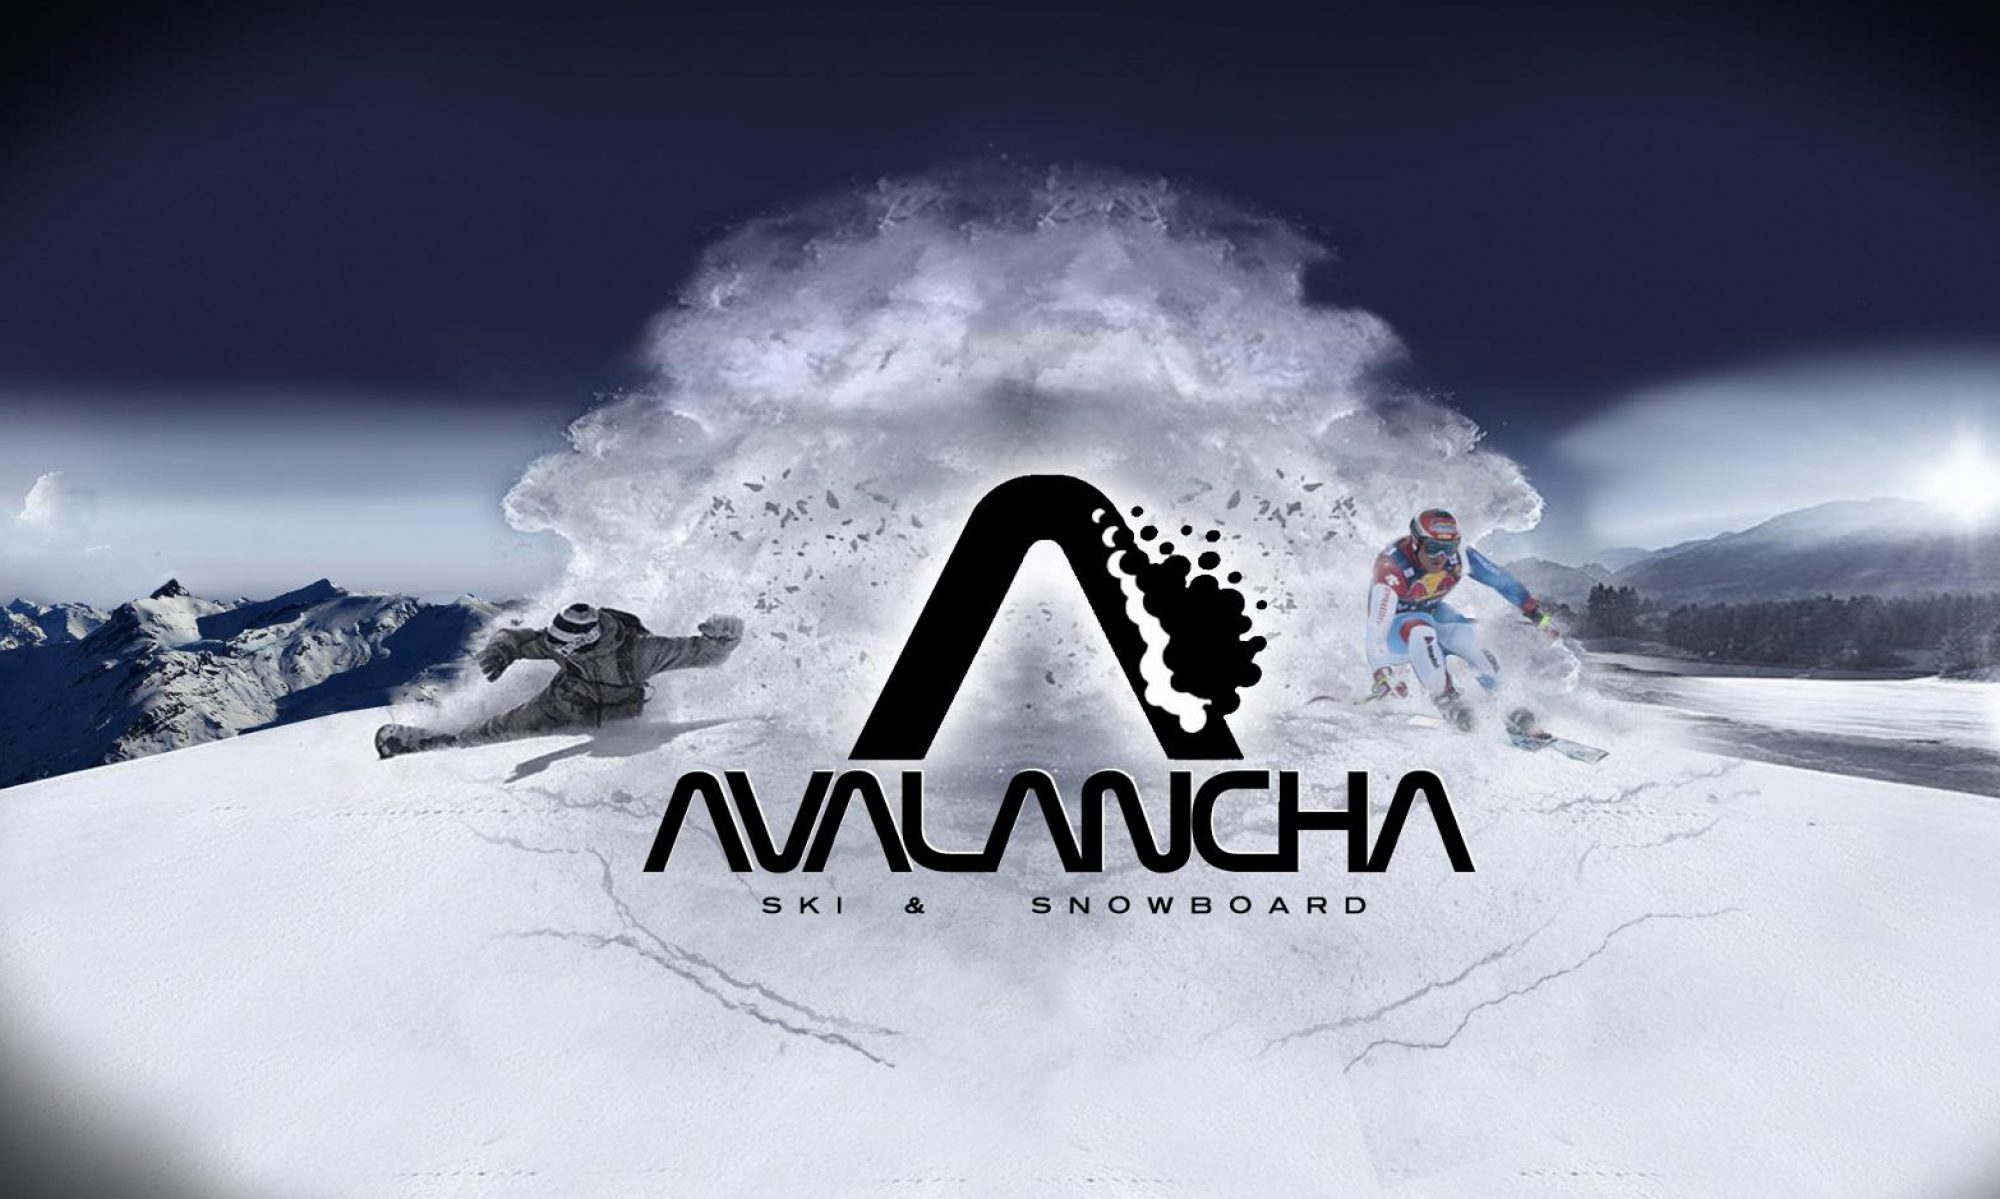 Club AVALANCHA